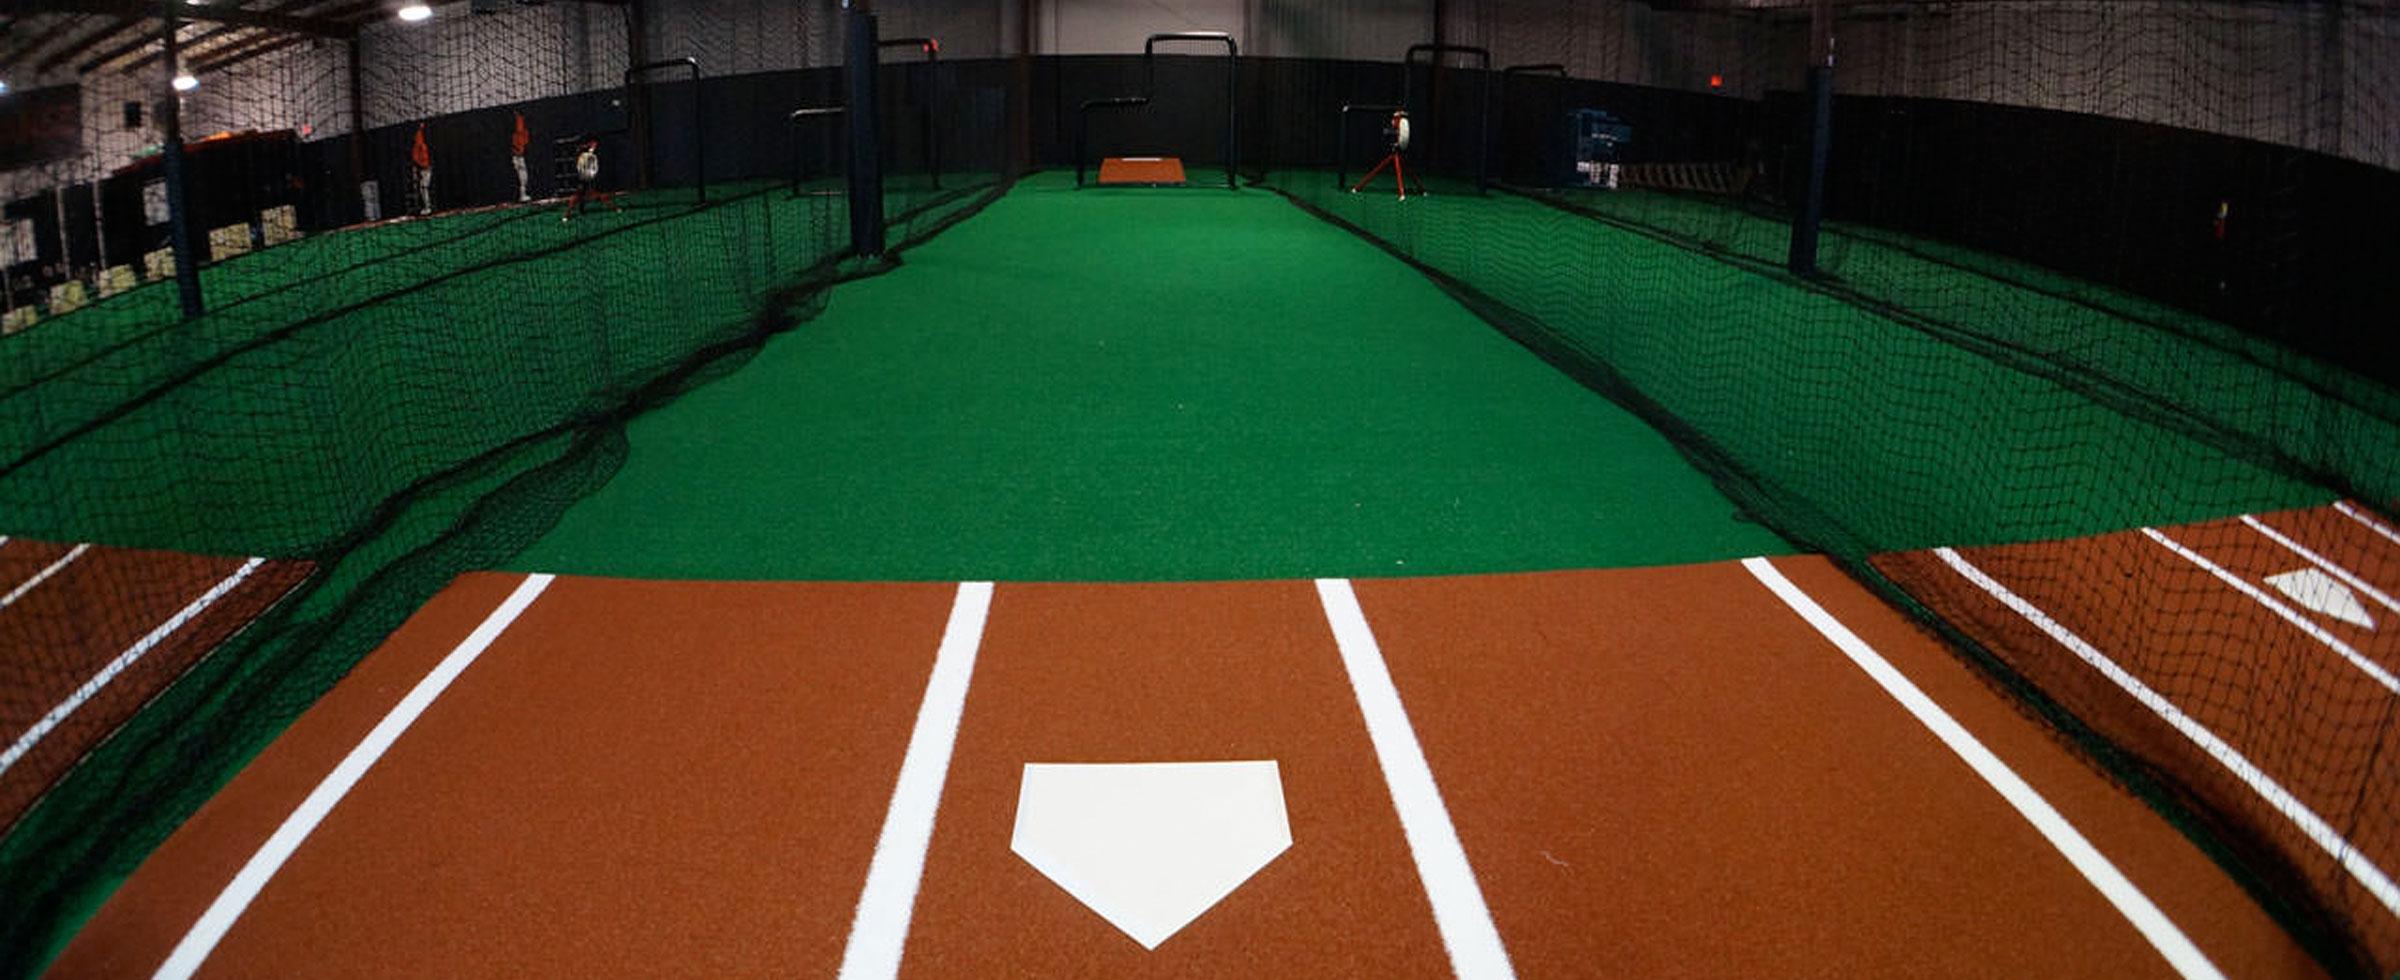 Proformance Baseball Academy